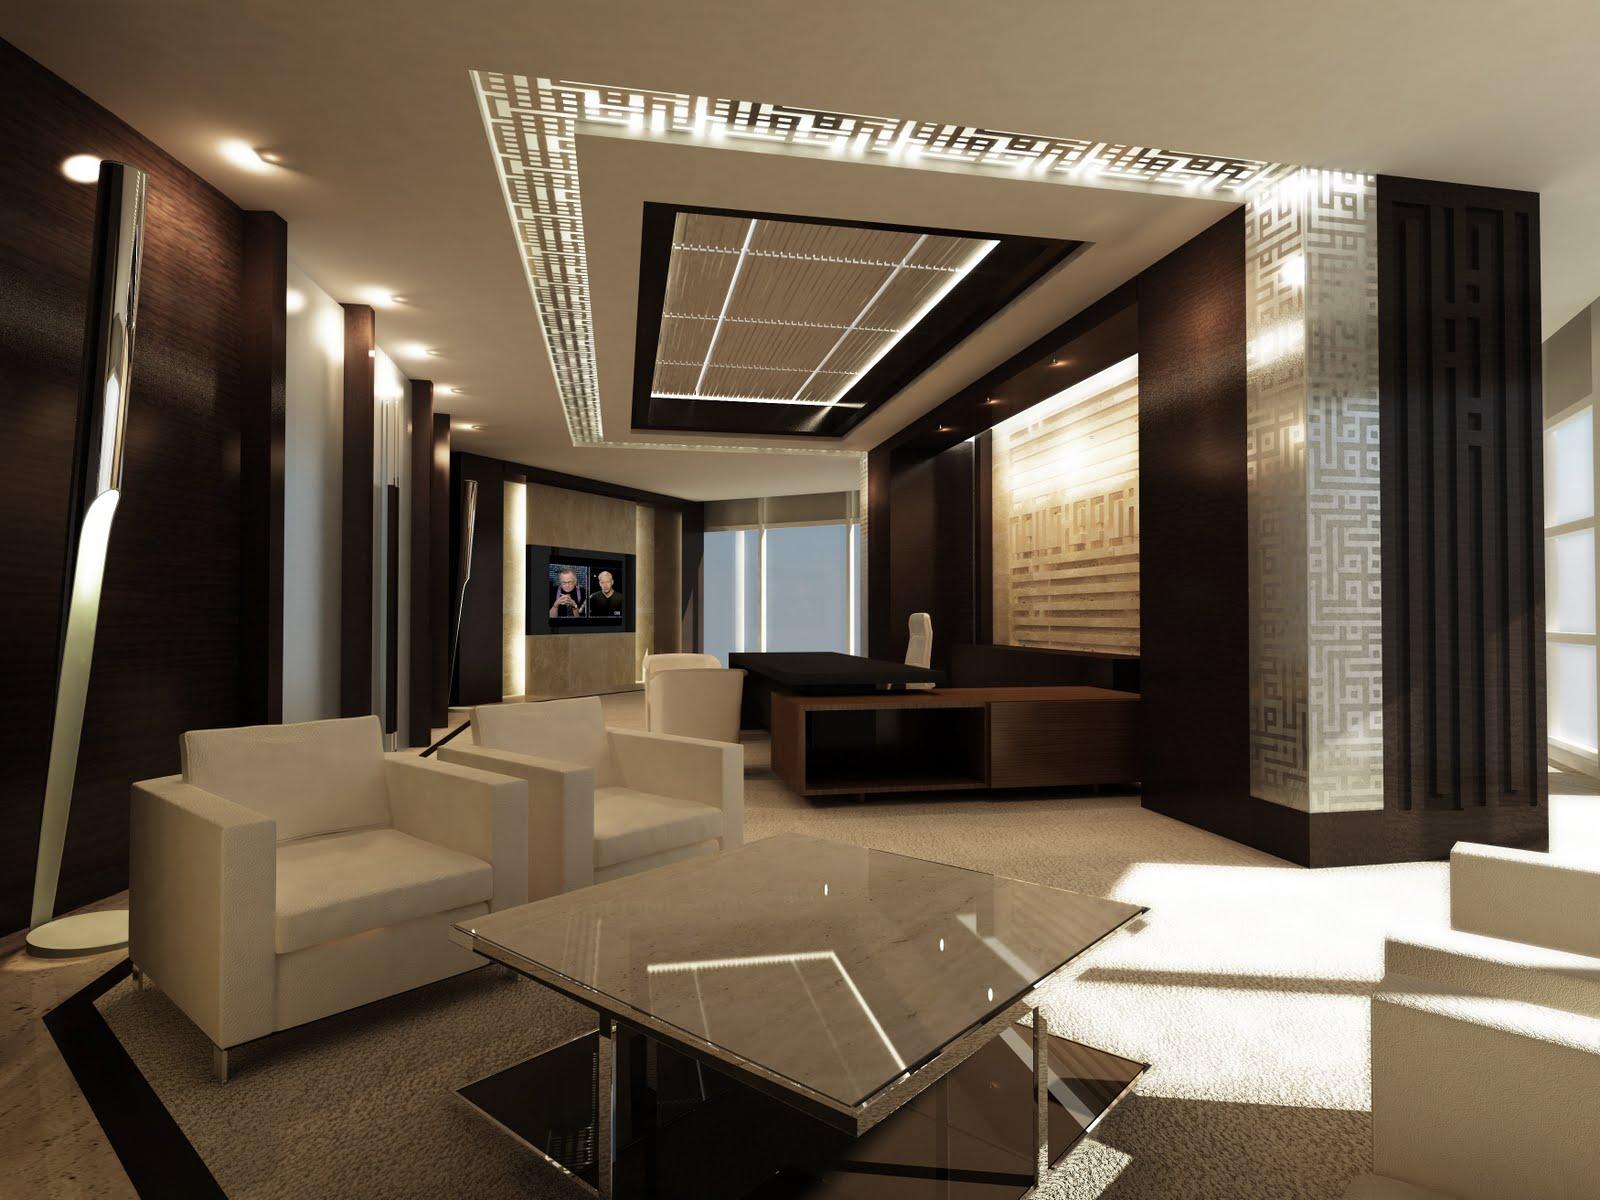 Office Interior Design Ideas: Tawazen Interior Design L.L.C: July 2011